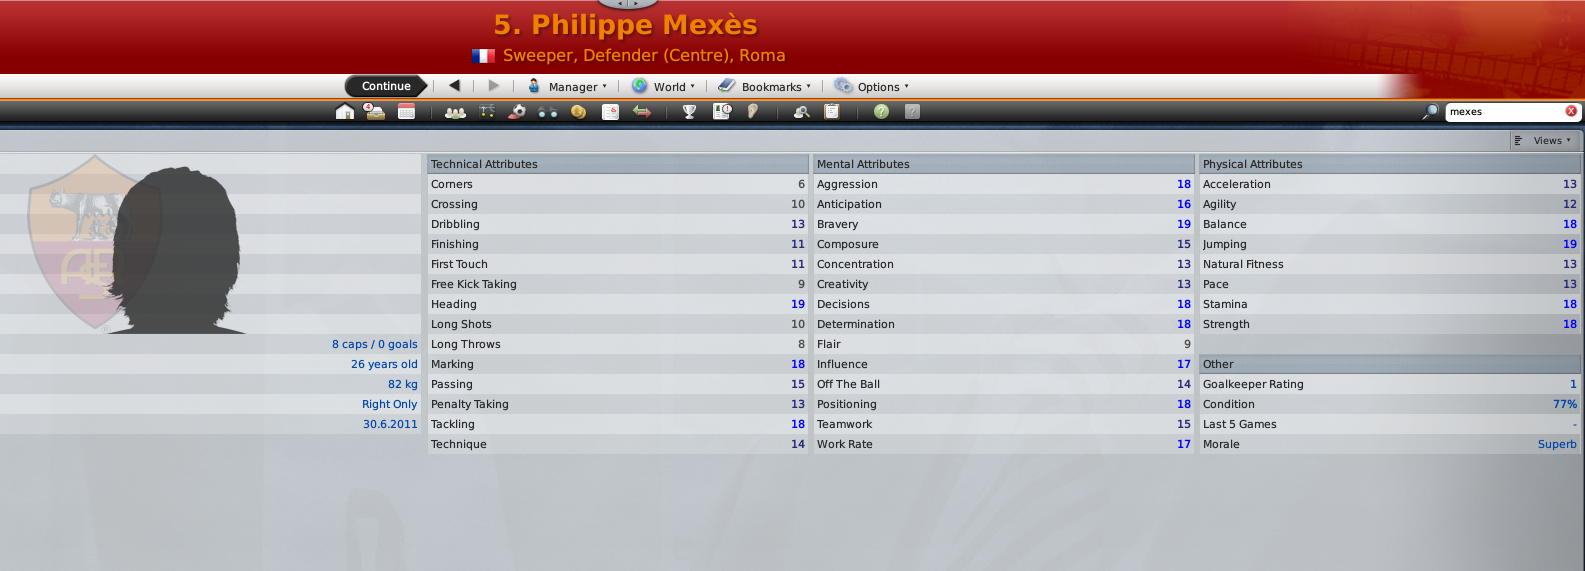 Mexes' FM09 Profile